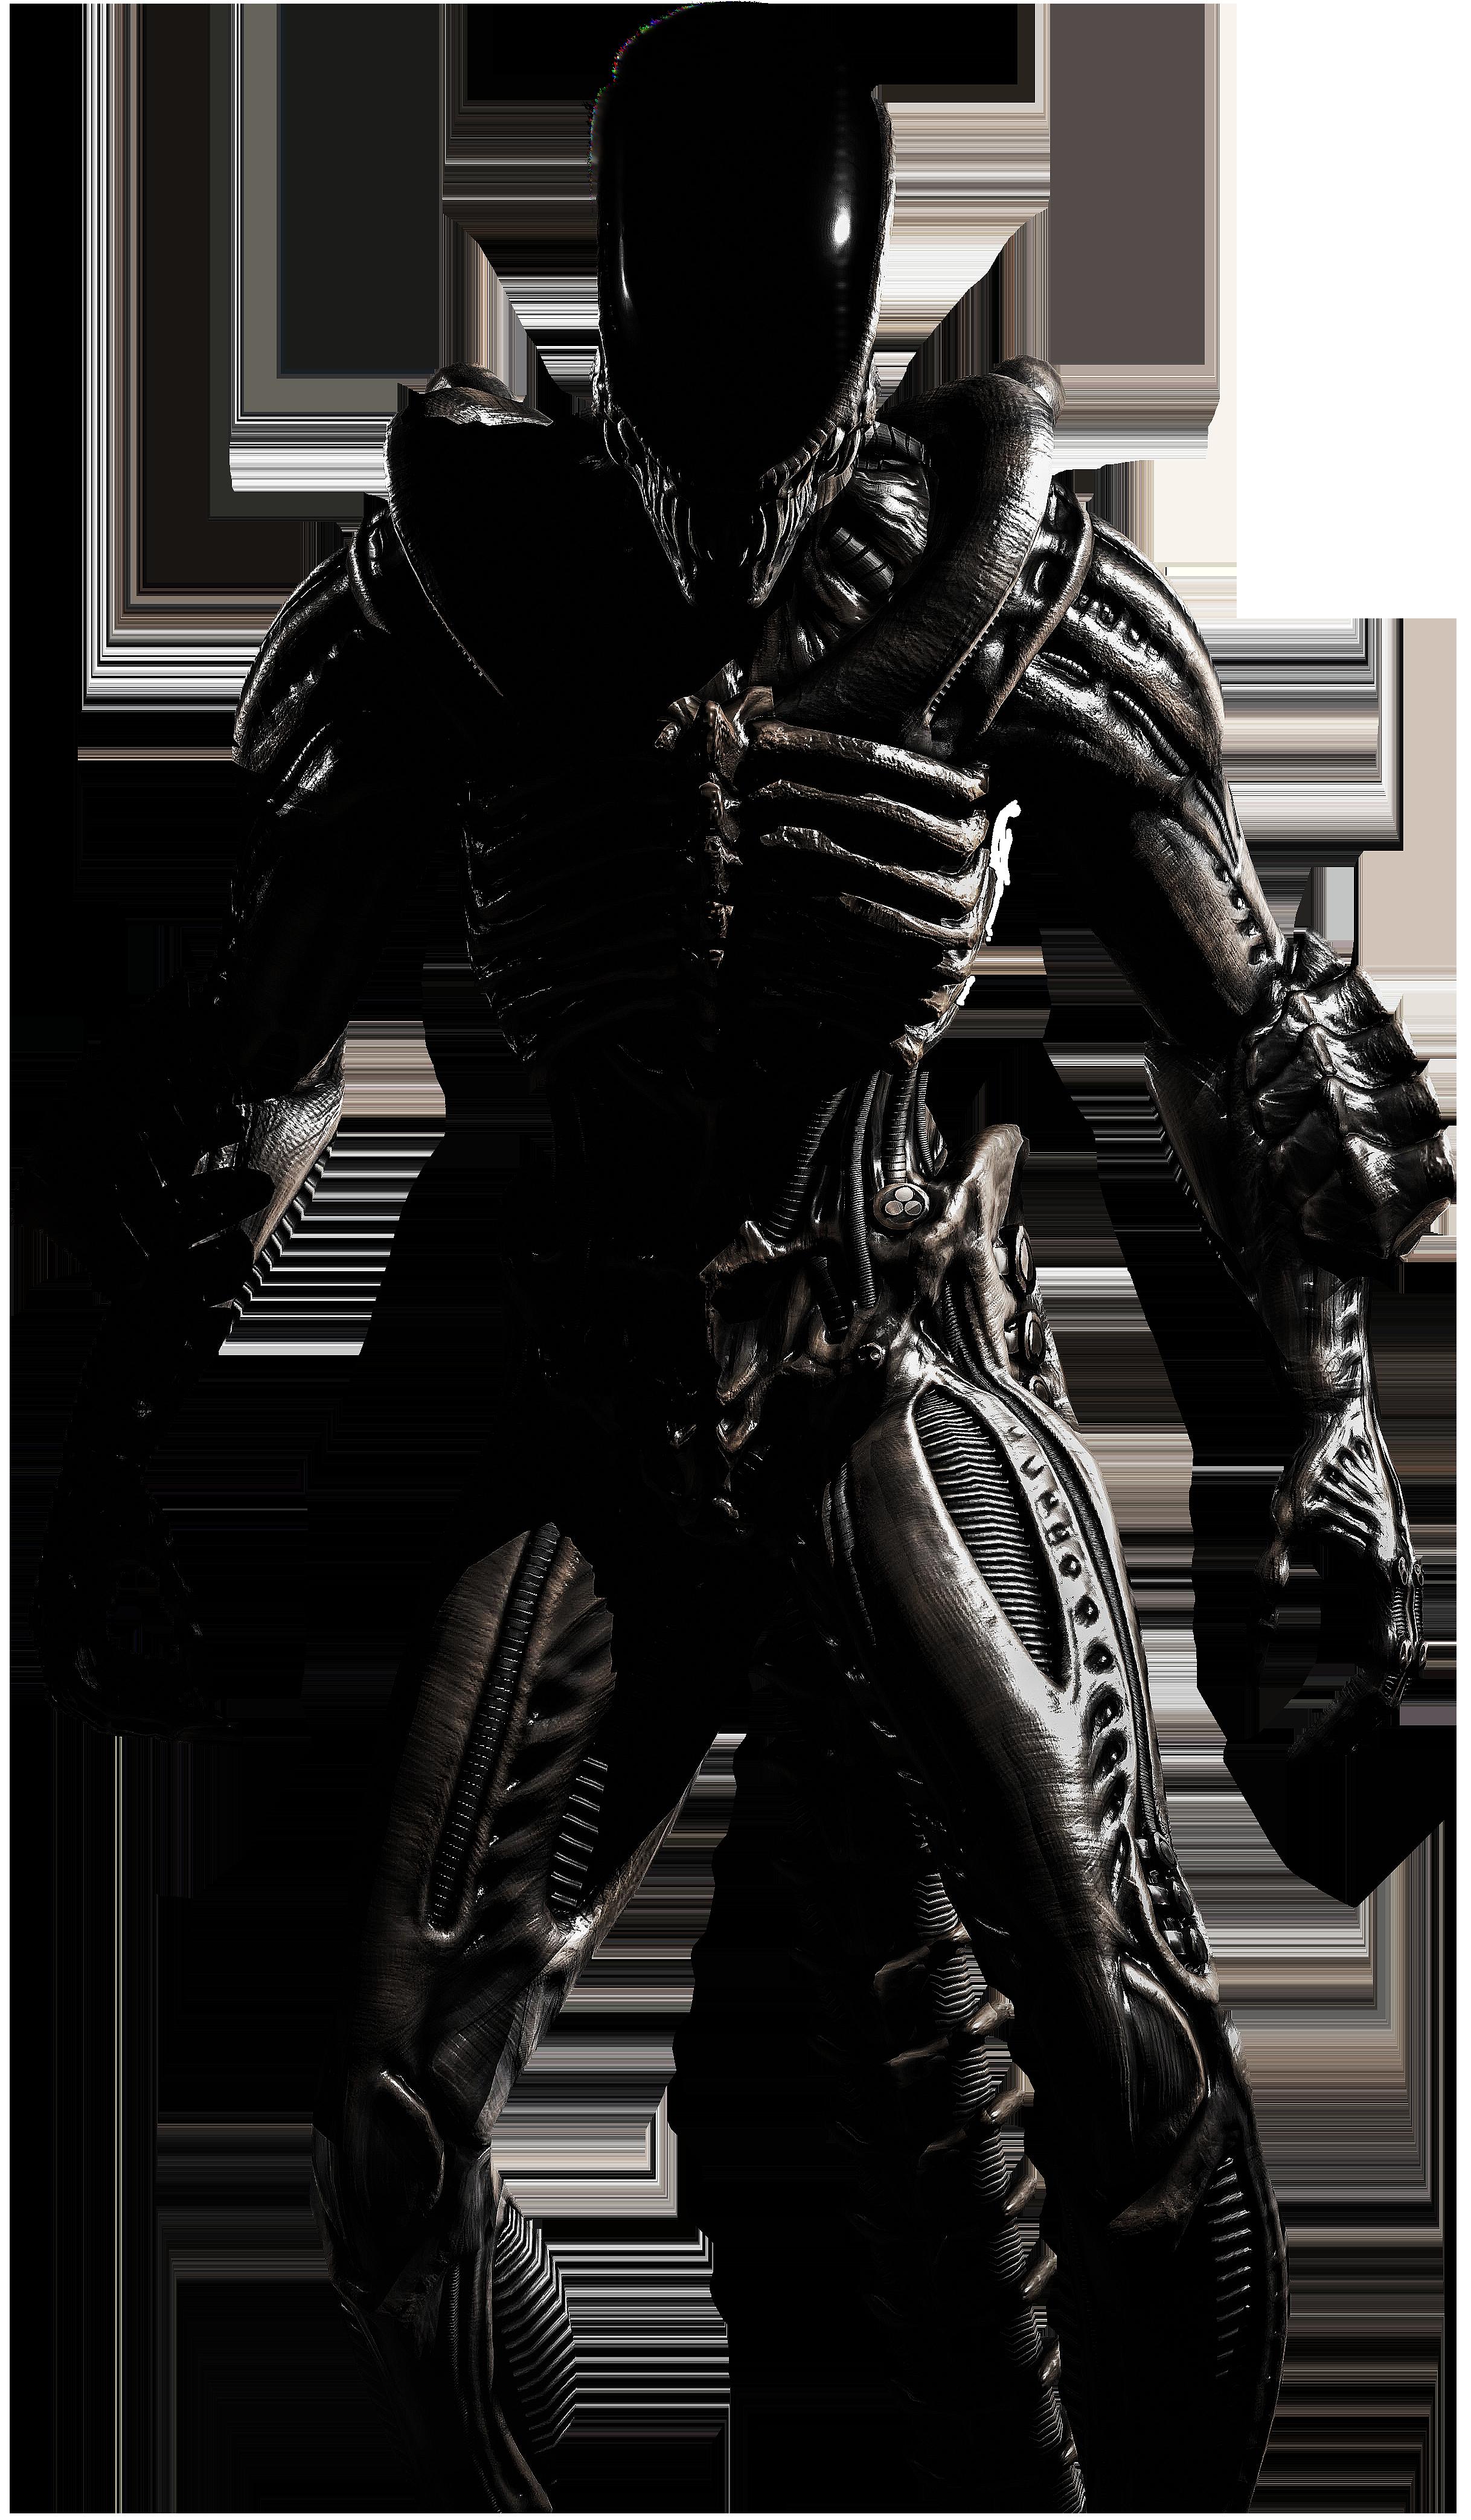 Alien_MKX_Render.png